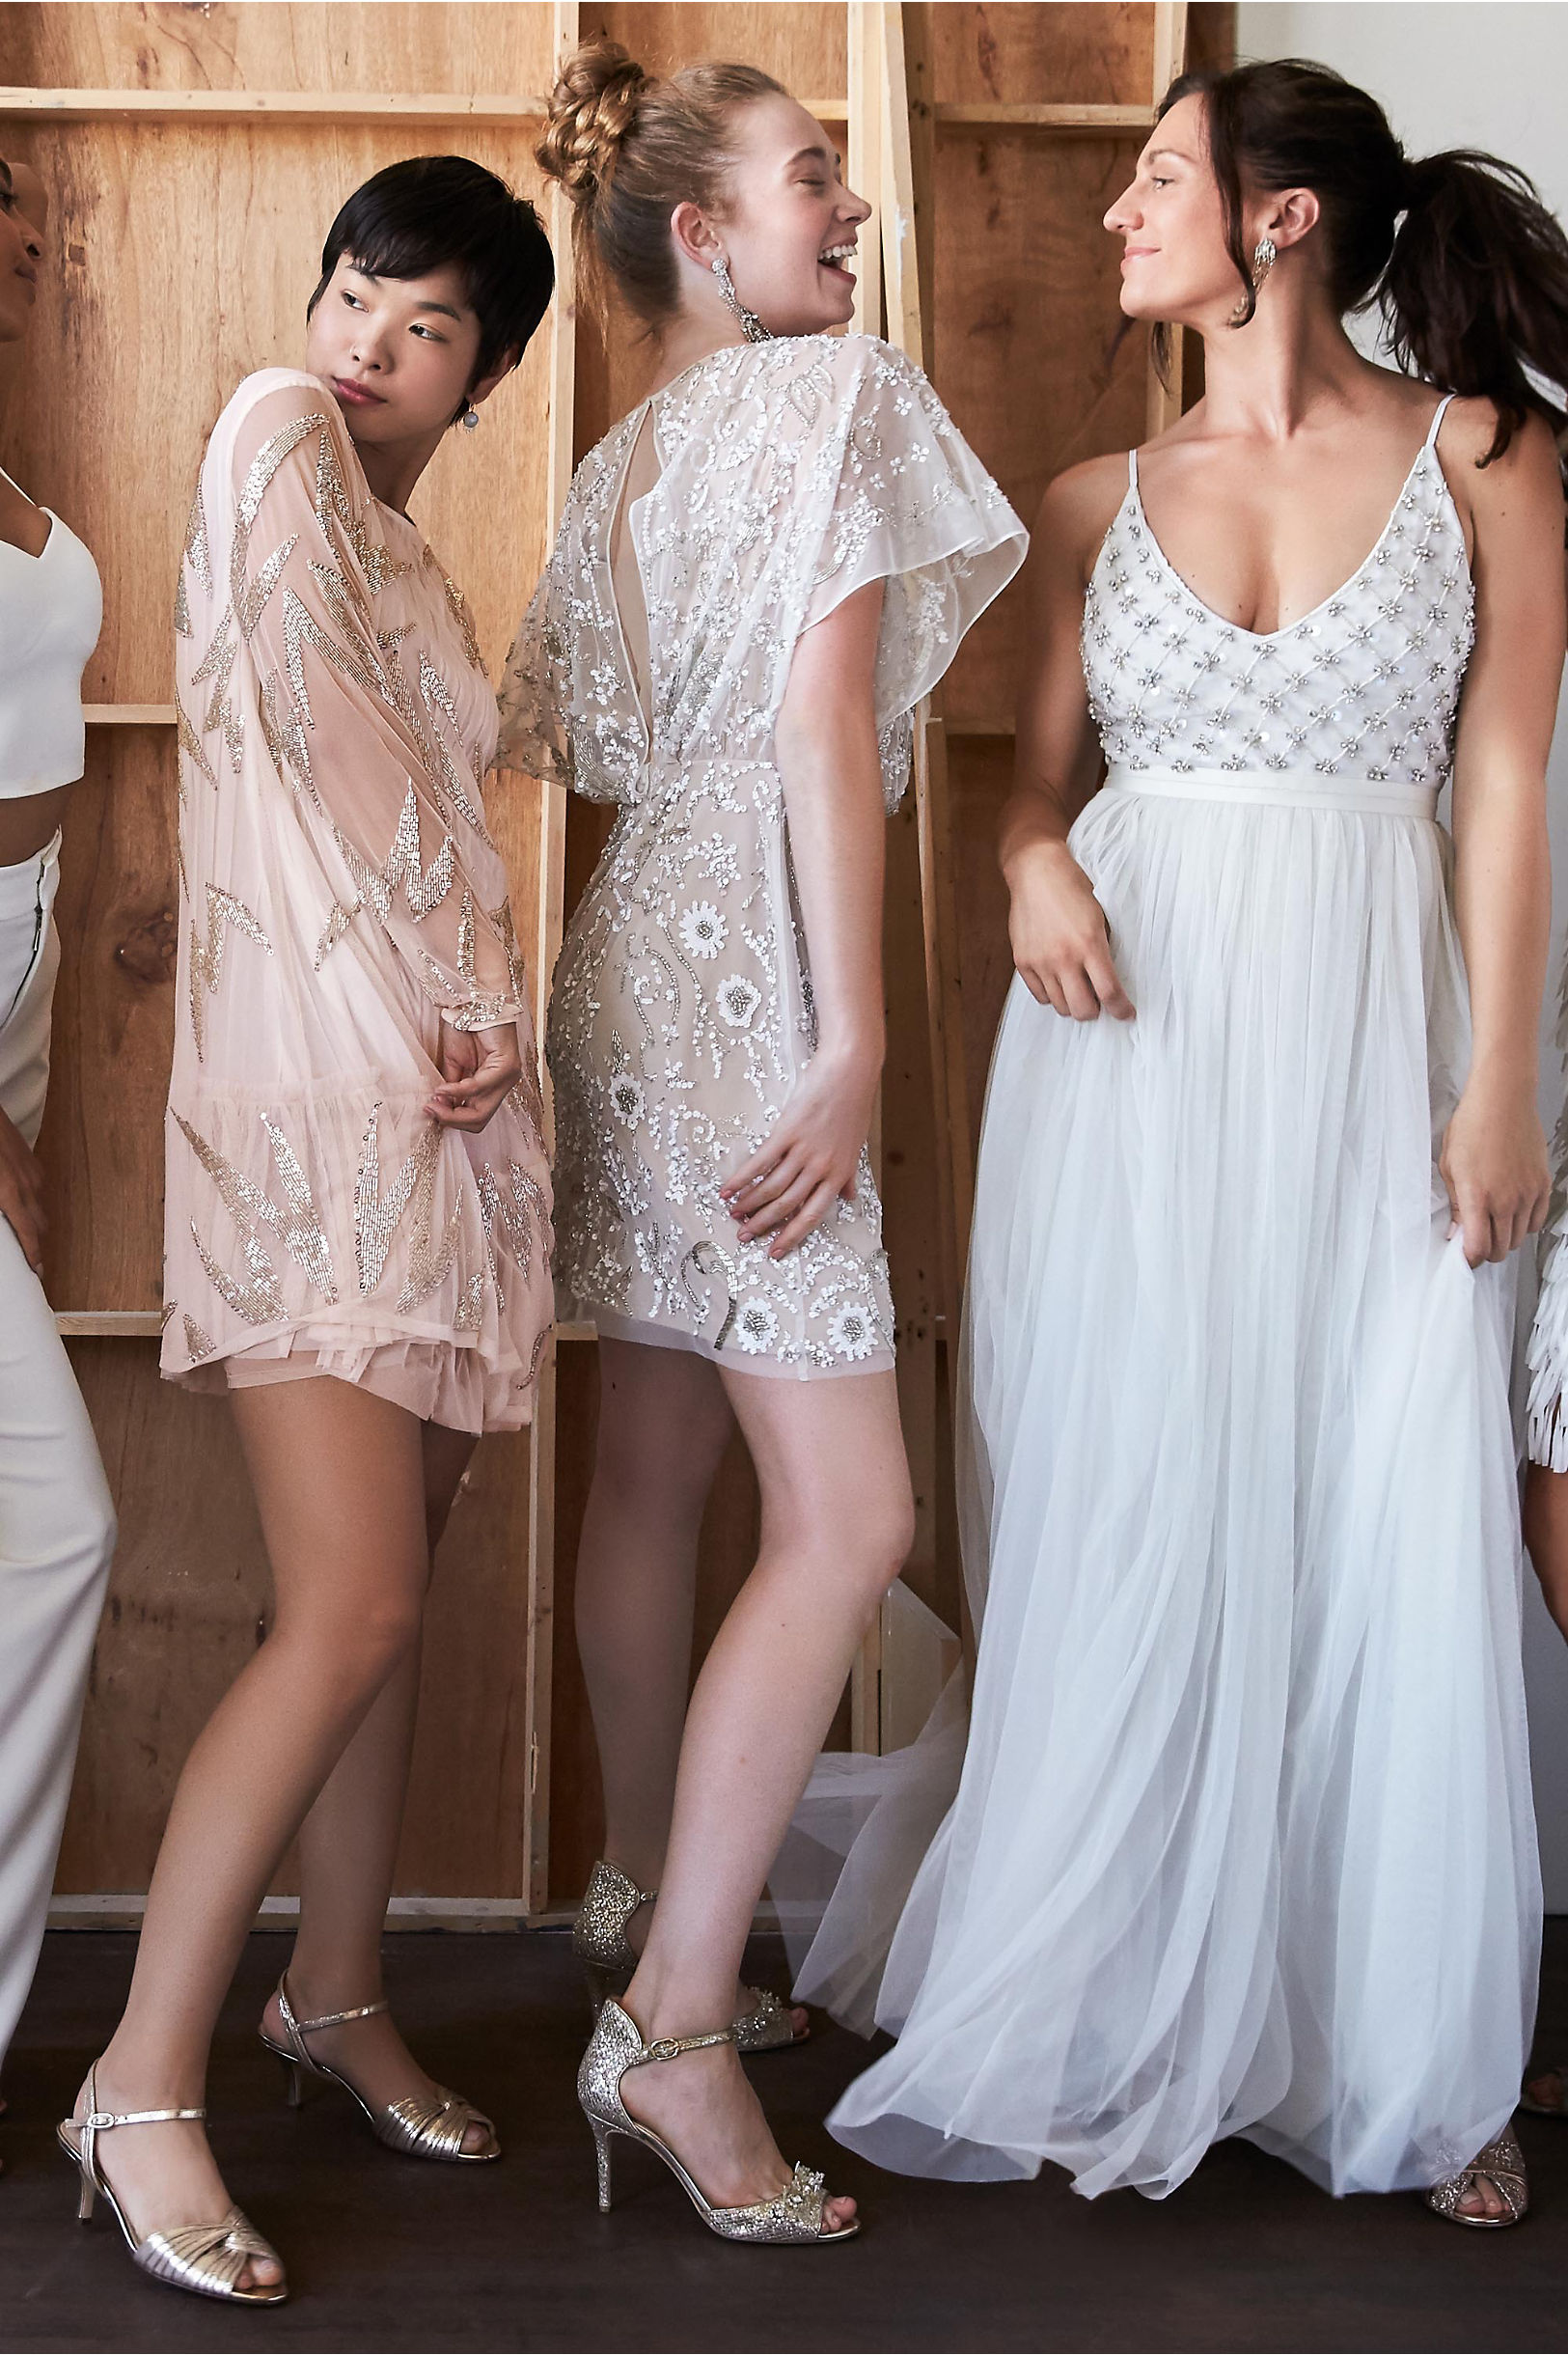 Meriden Dress in Sale | BHLDN